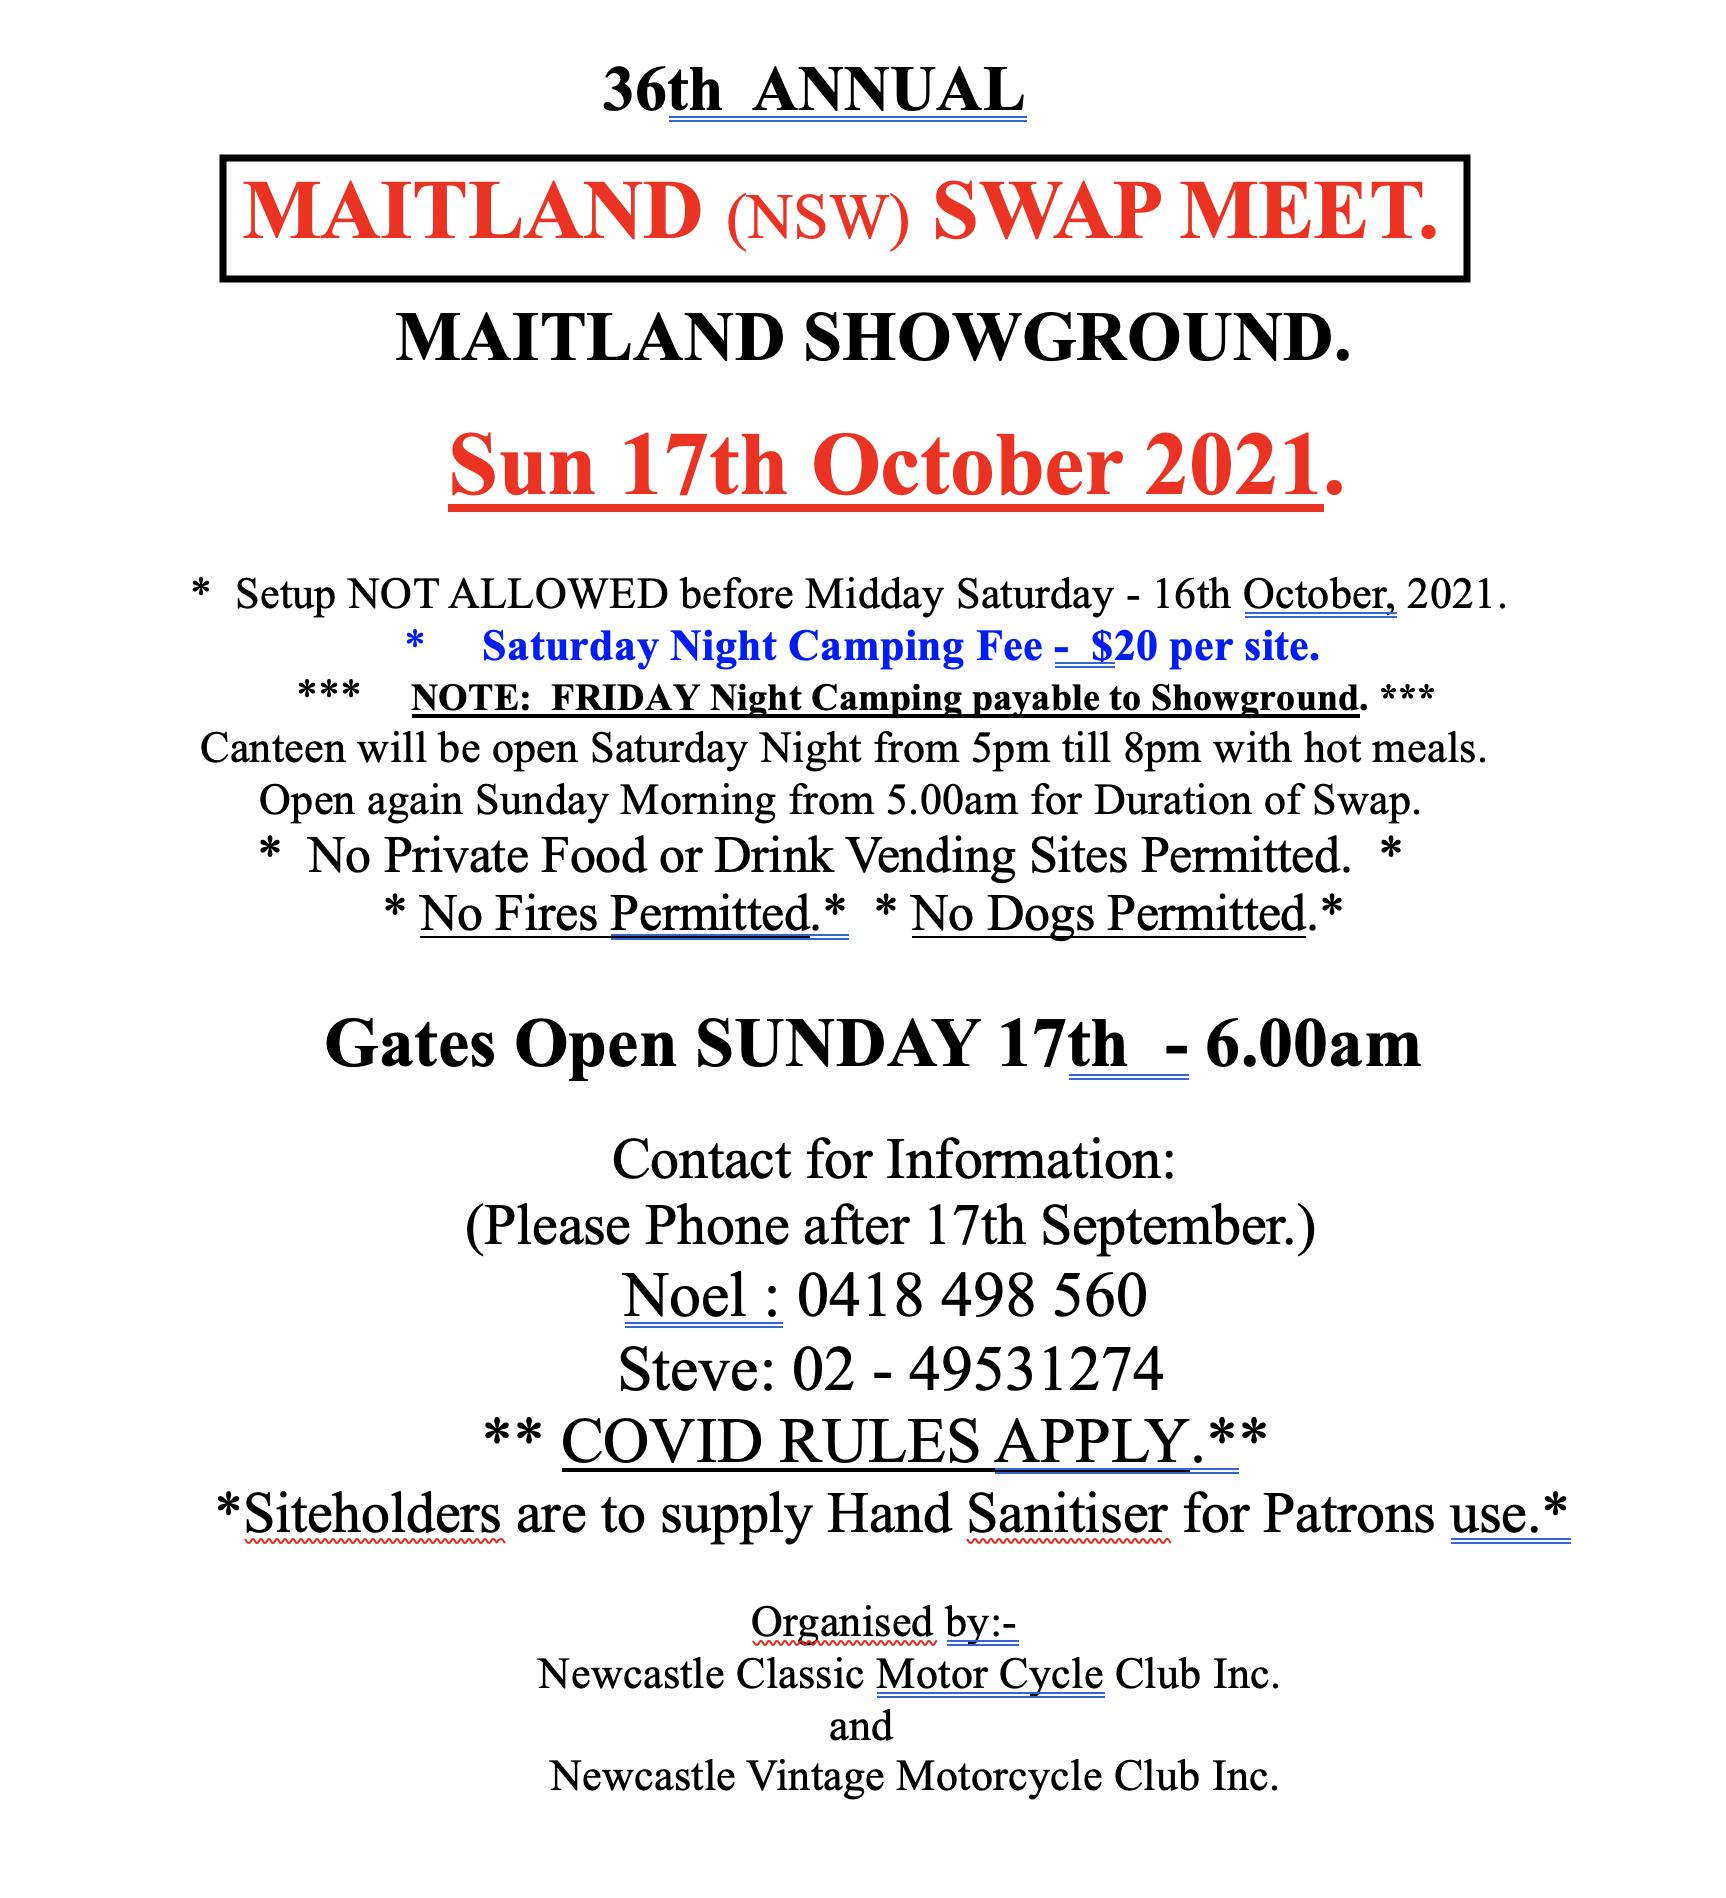 Maitland Swapmeet 2021 @ Maitland Showground | South Maitland | New South Wales | Australia